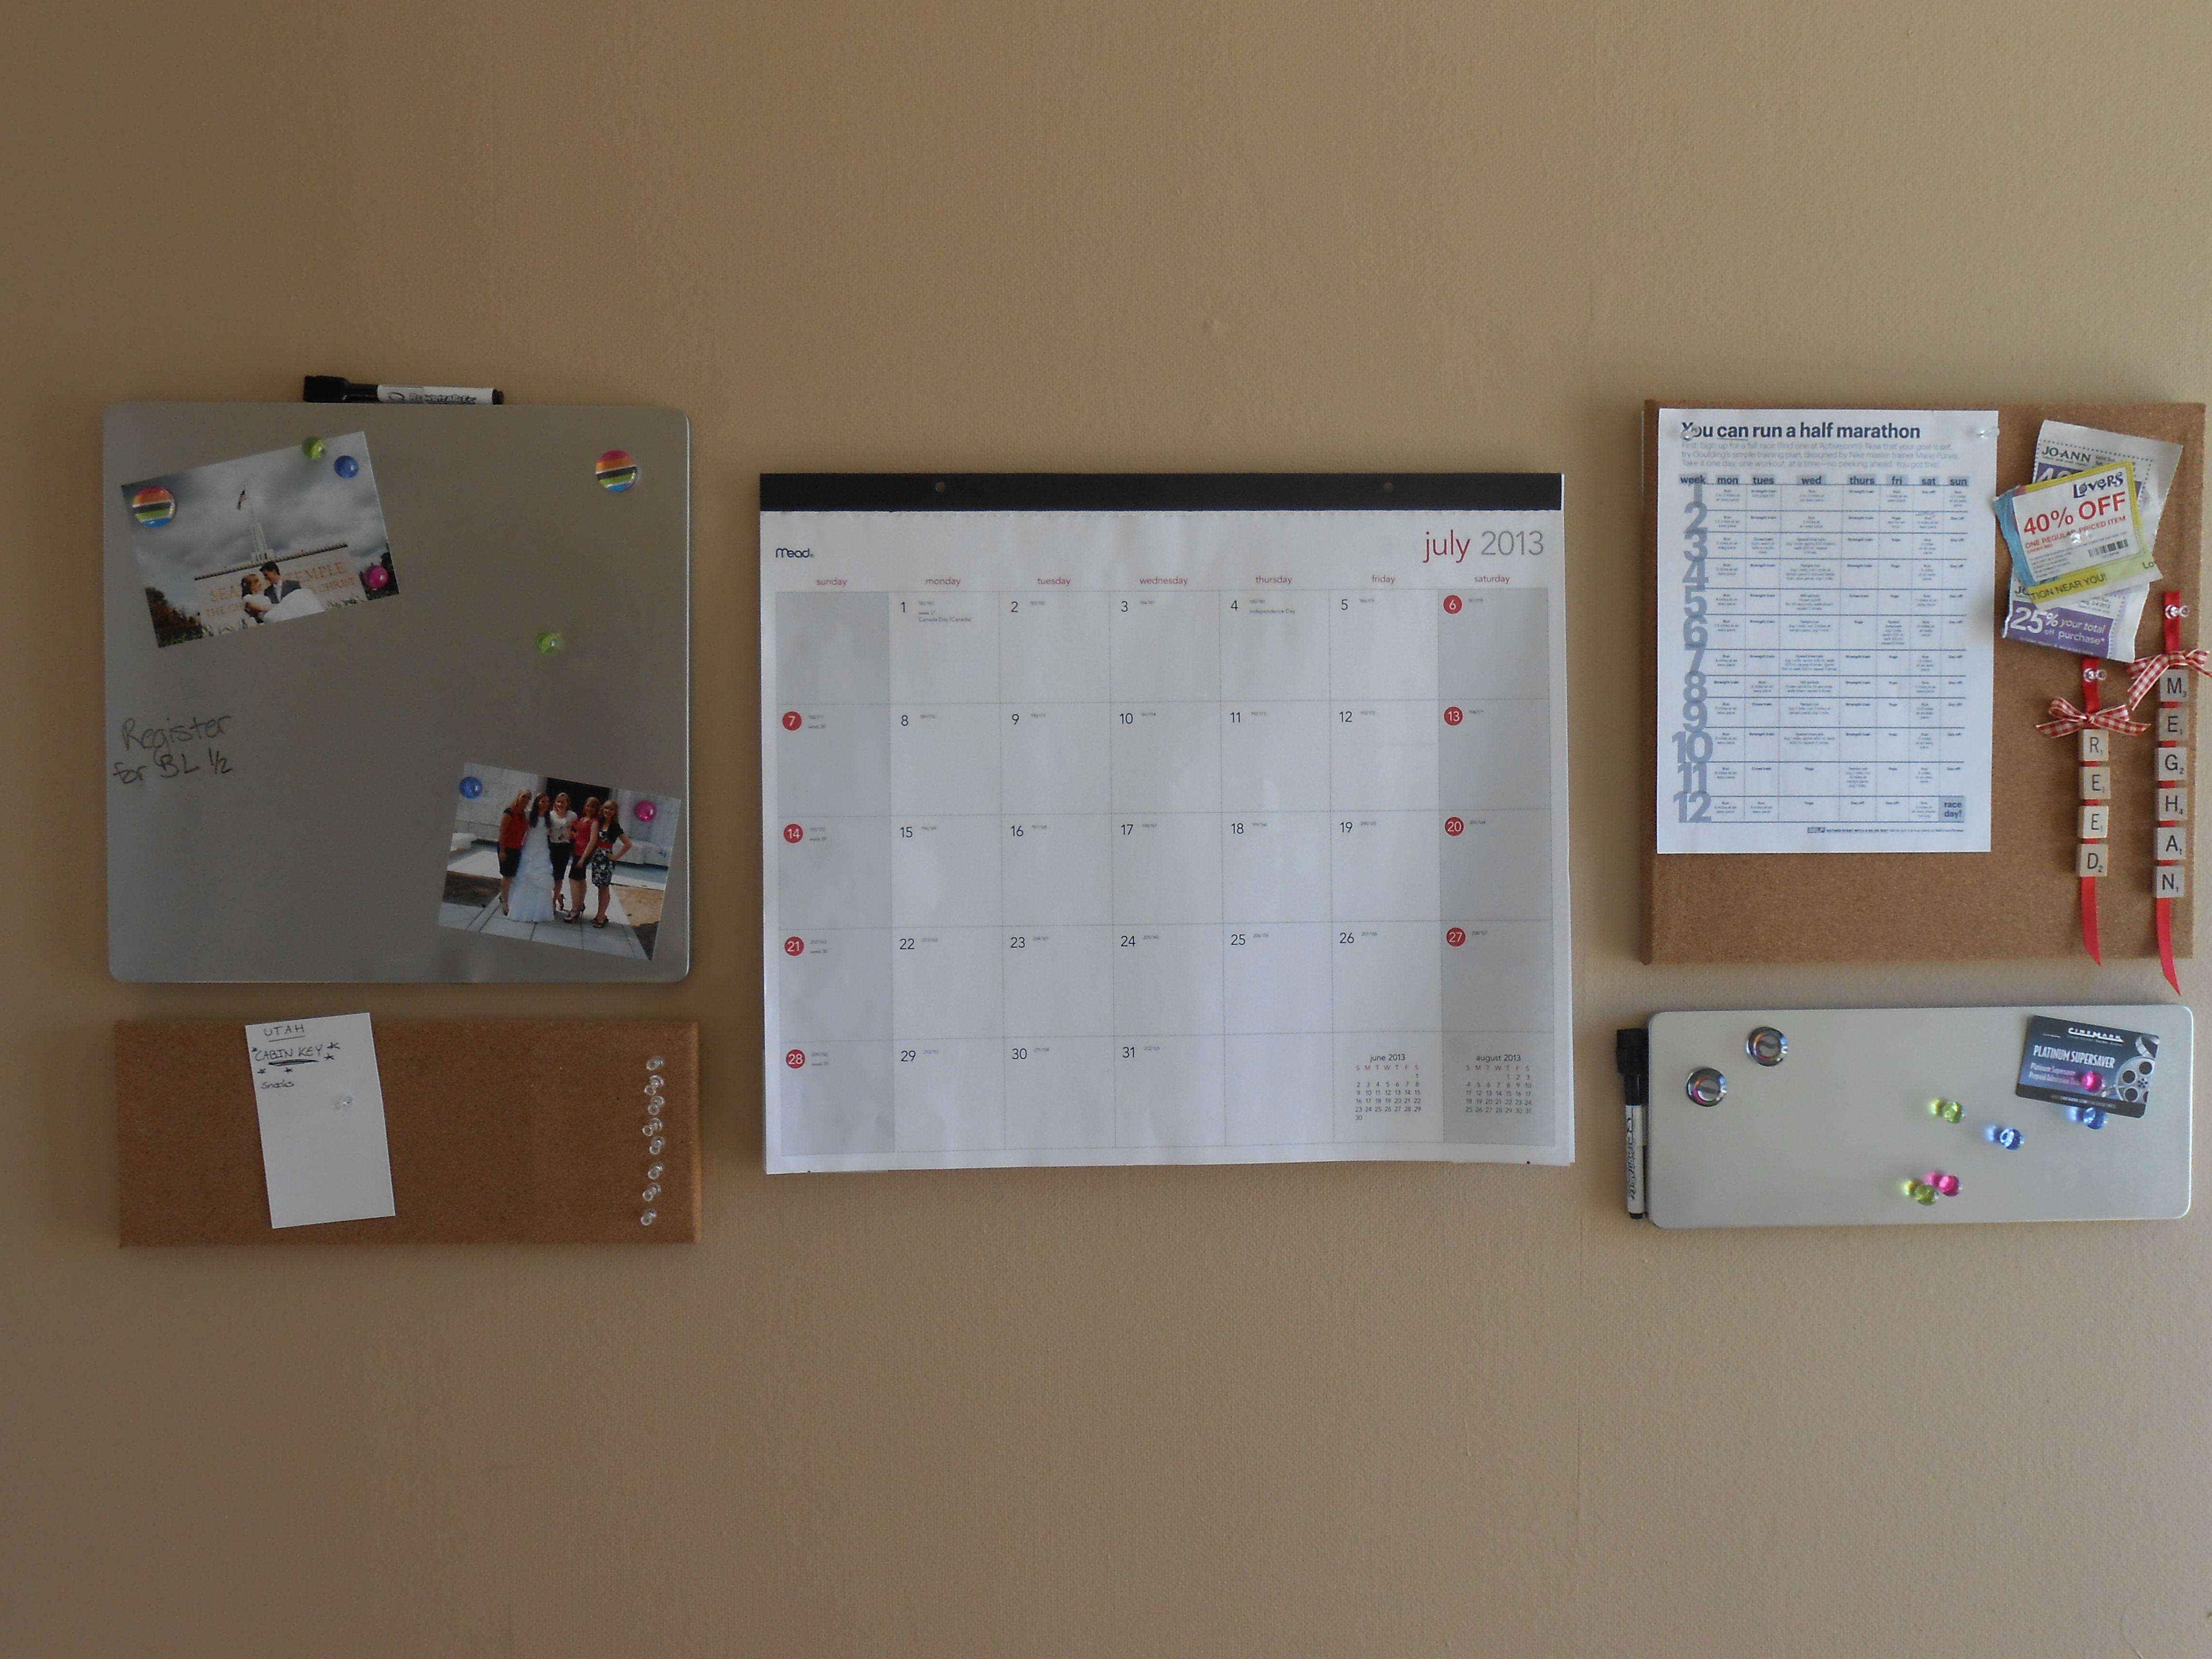 30 Command Center Quartet Modular Boards And A Desk Calendar Hang On Walls Using Command Strips With Images Desk Calendars Command Center Command Strips